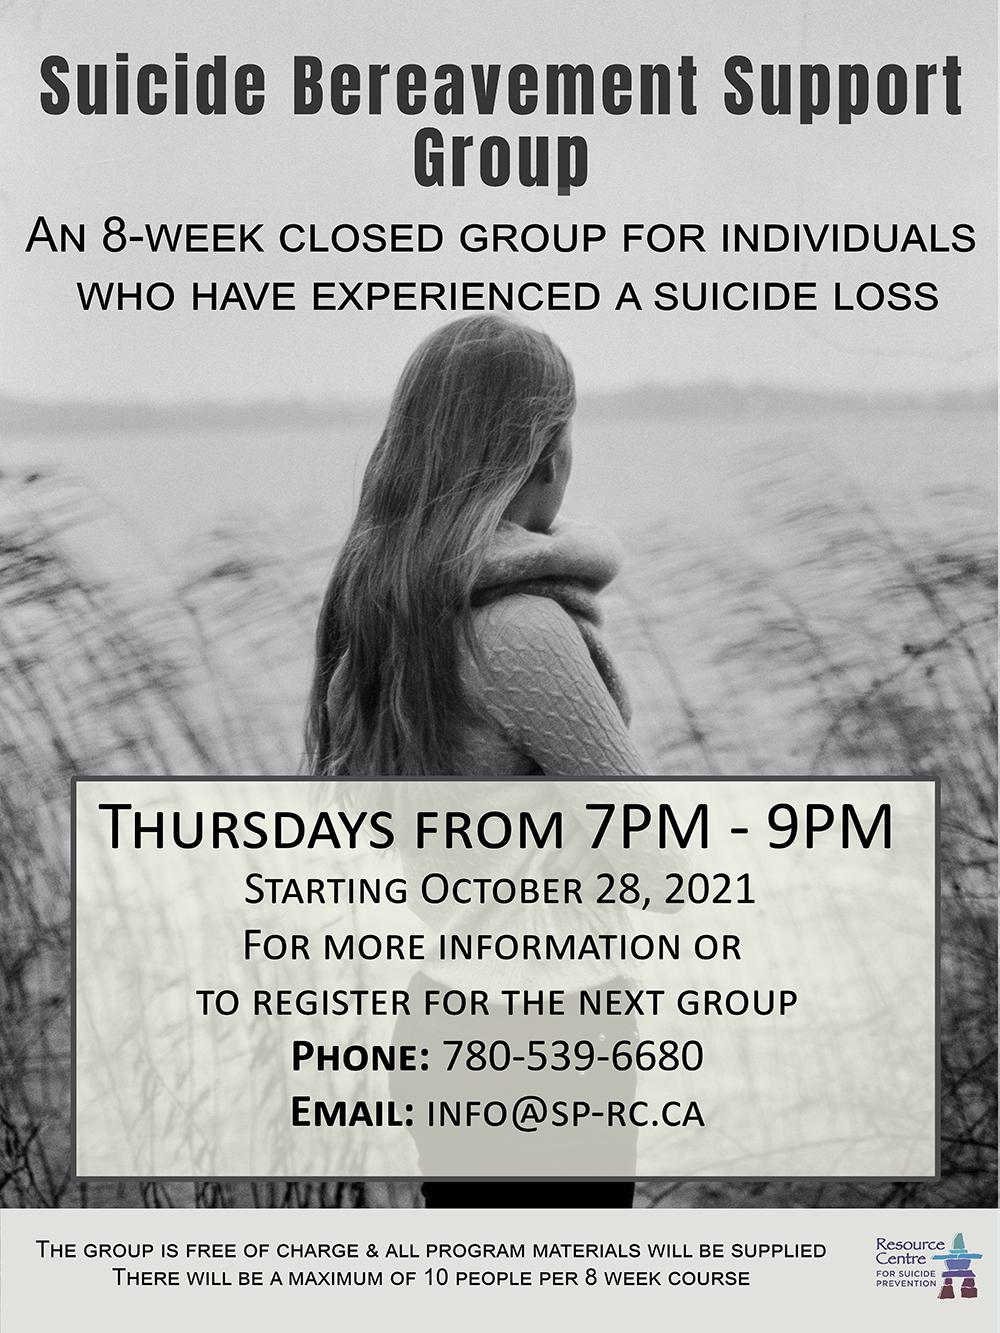 Suicide Bereavement Support Group Grande Prairie